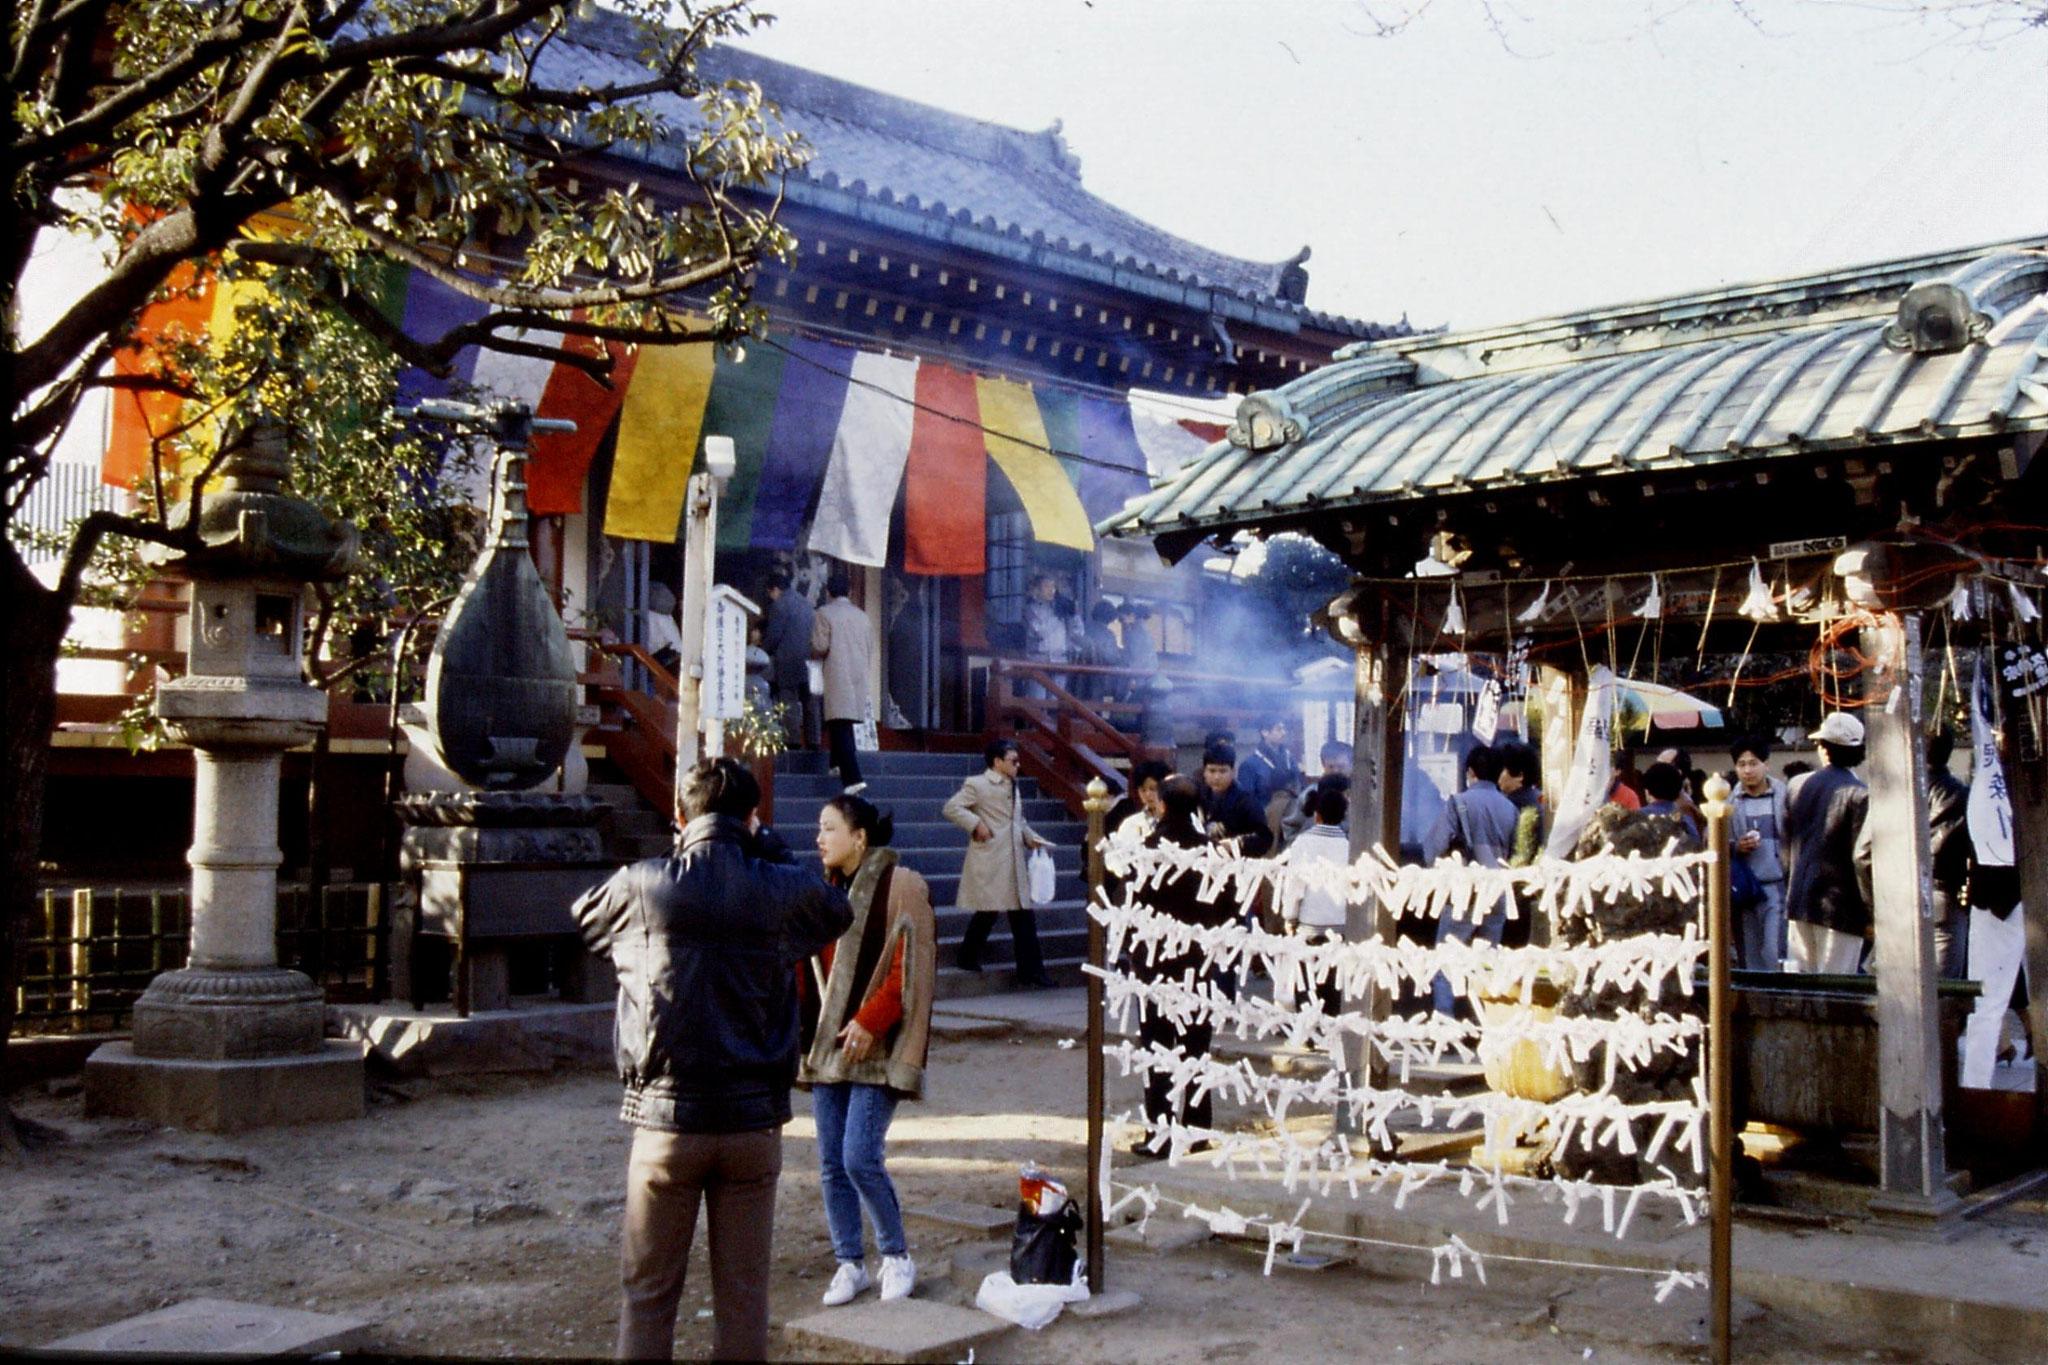 4/1/1989: 2: Ueno Park